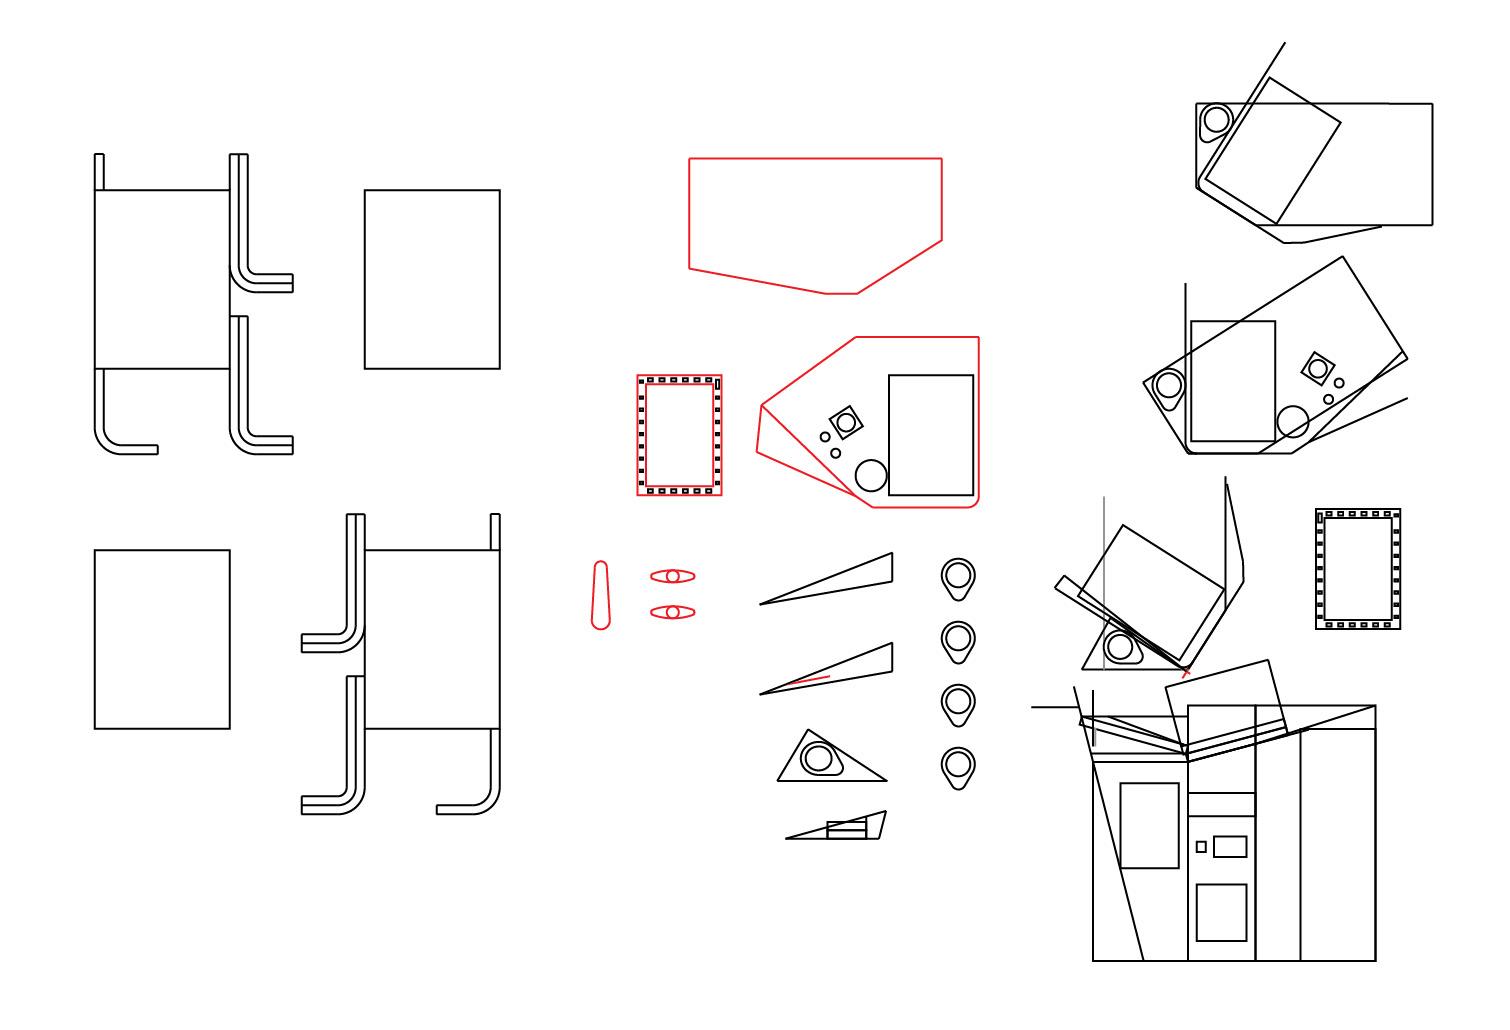 Cabin - cockpit - drawings 3.jpg